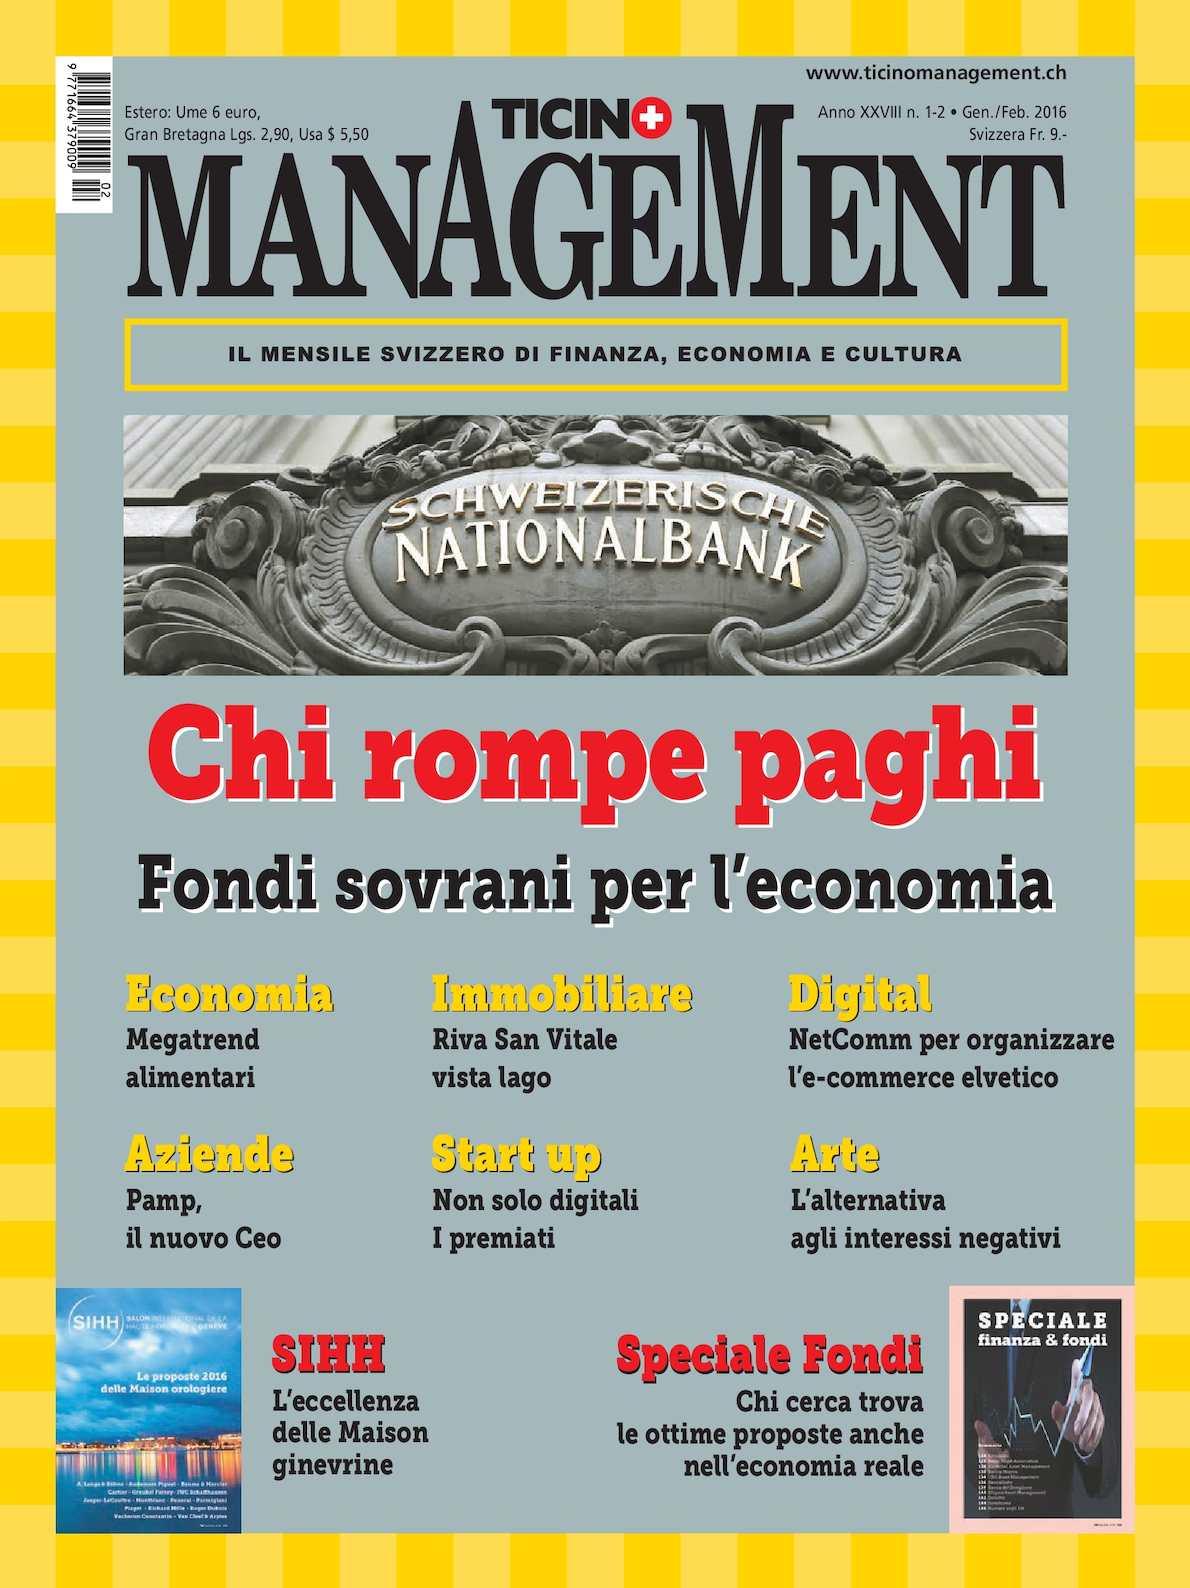 e6e3d9ea5c Calaméo - Ticino Management Gen Feb 2016